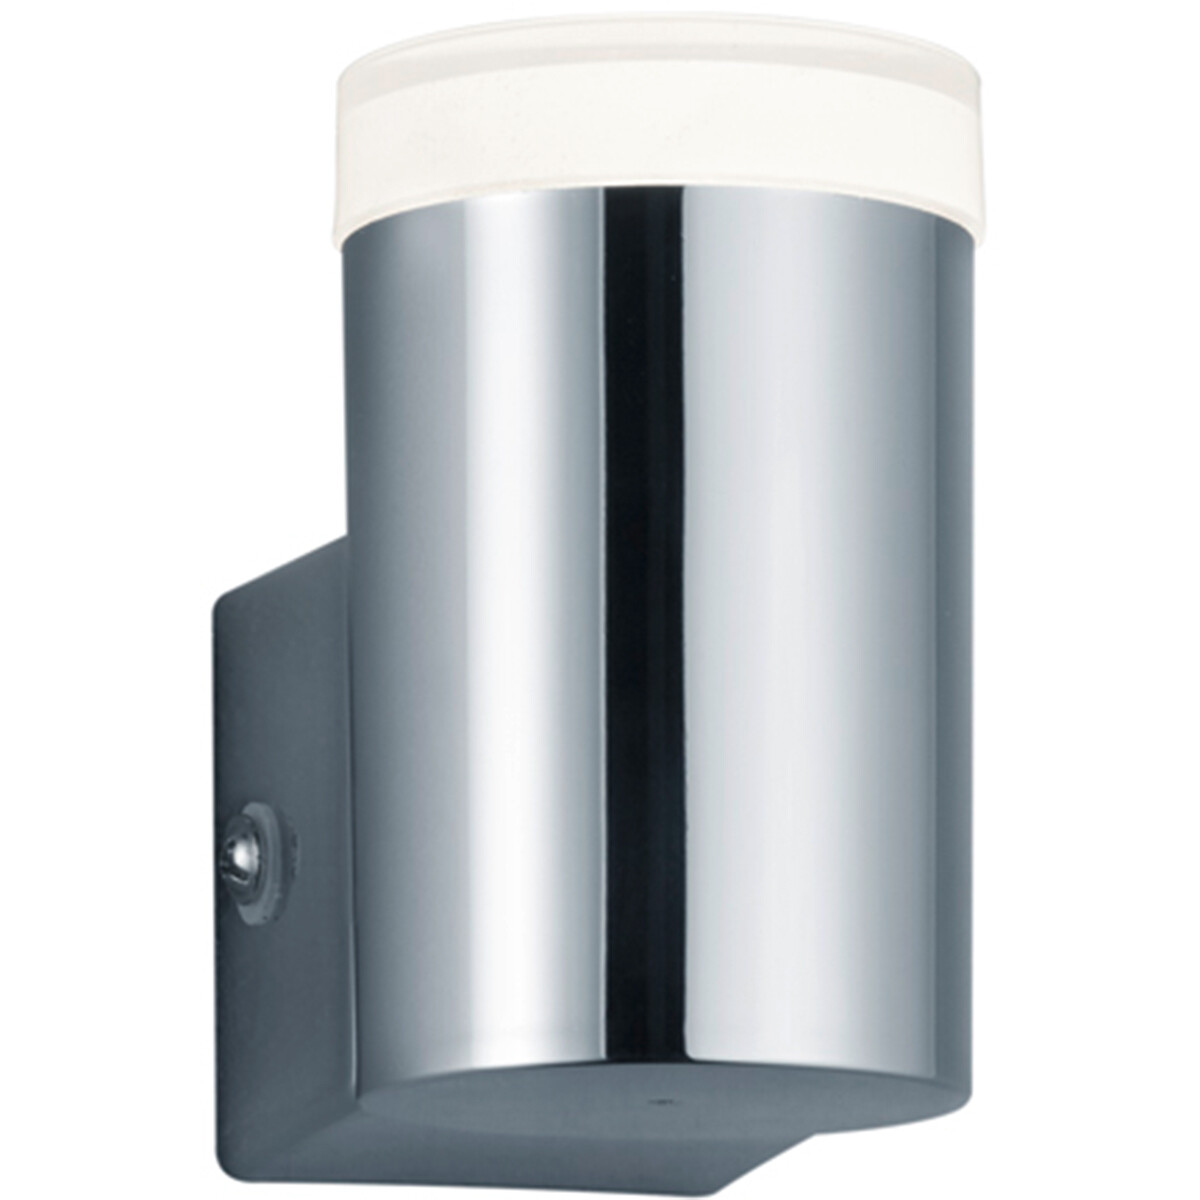 LED Wandlamp - Wandverlichting - Trion Yar - 4W - Warm Wit 3000K - Rond - Mat Chroom - Kunststof